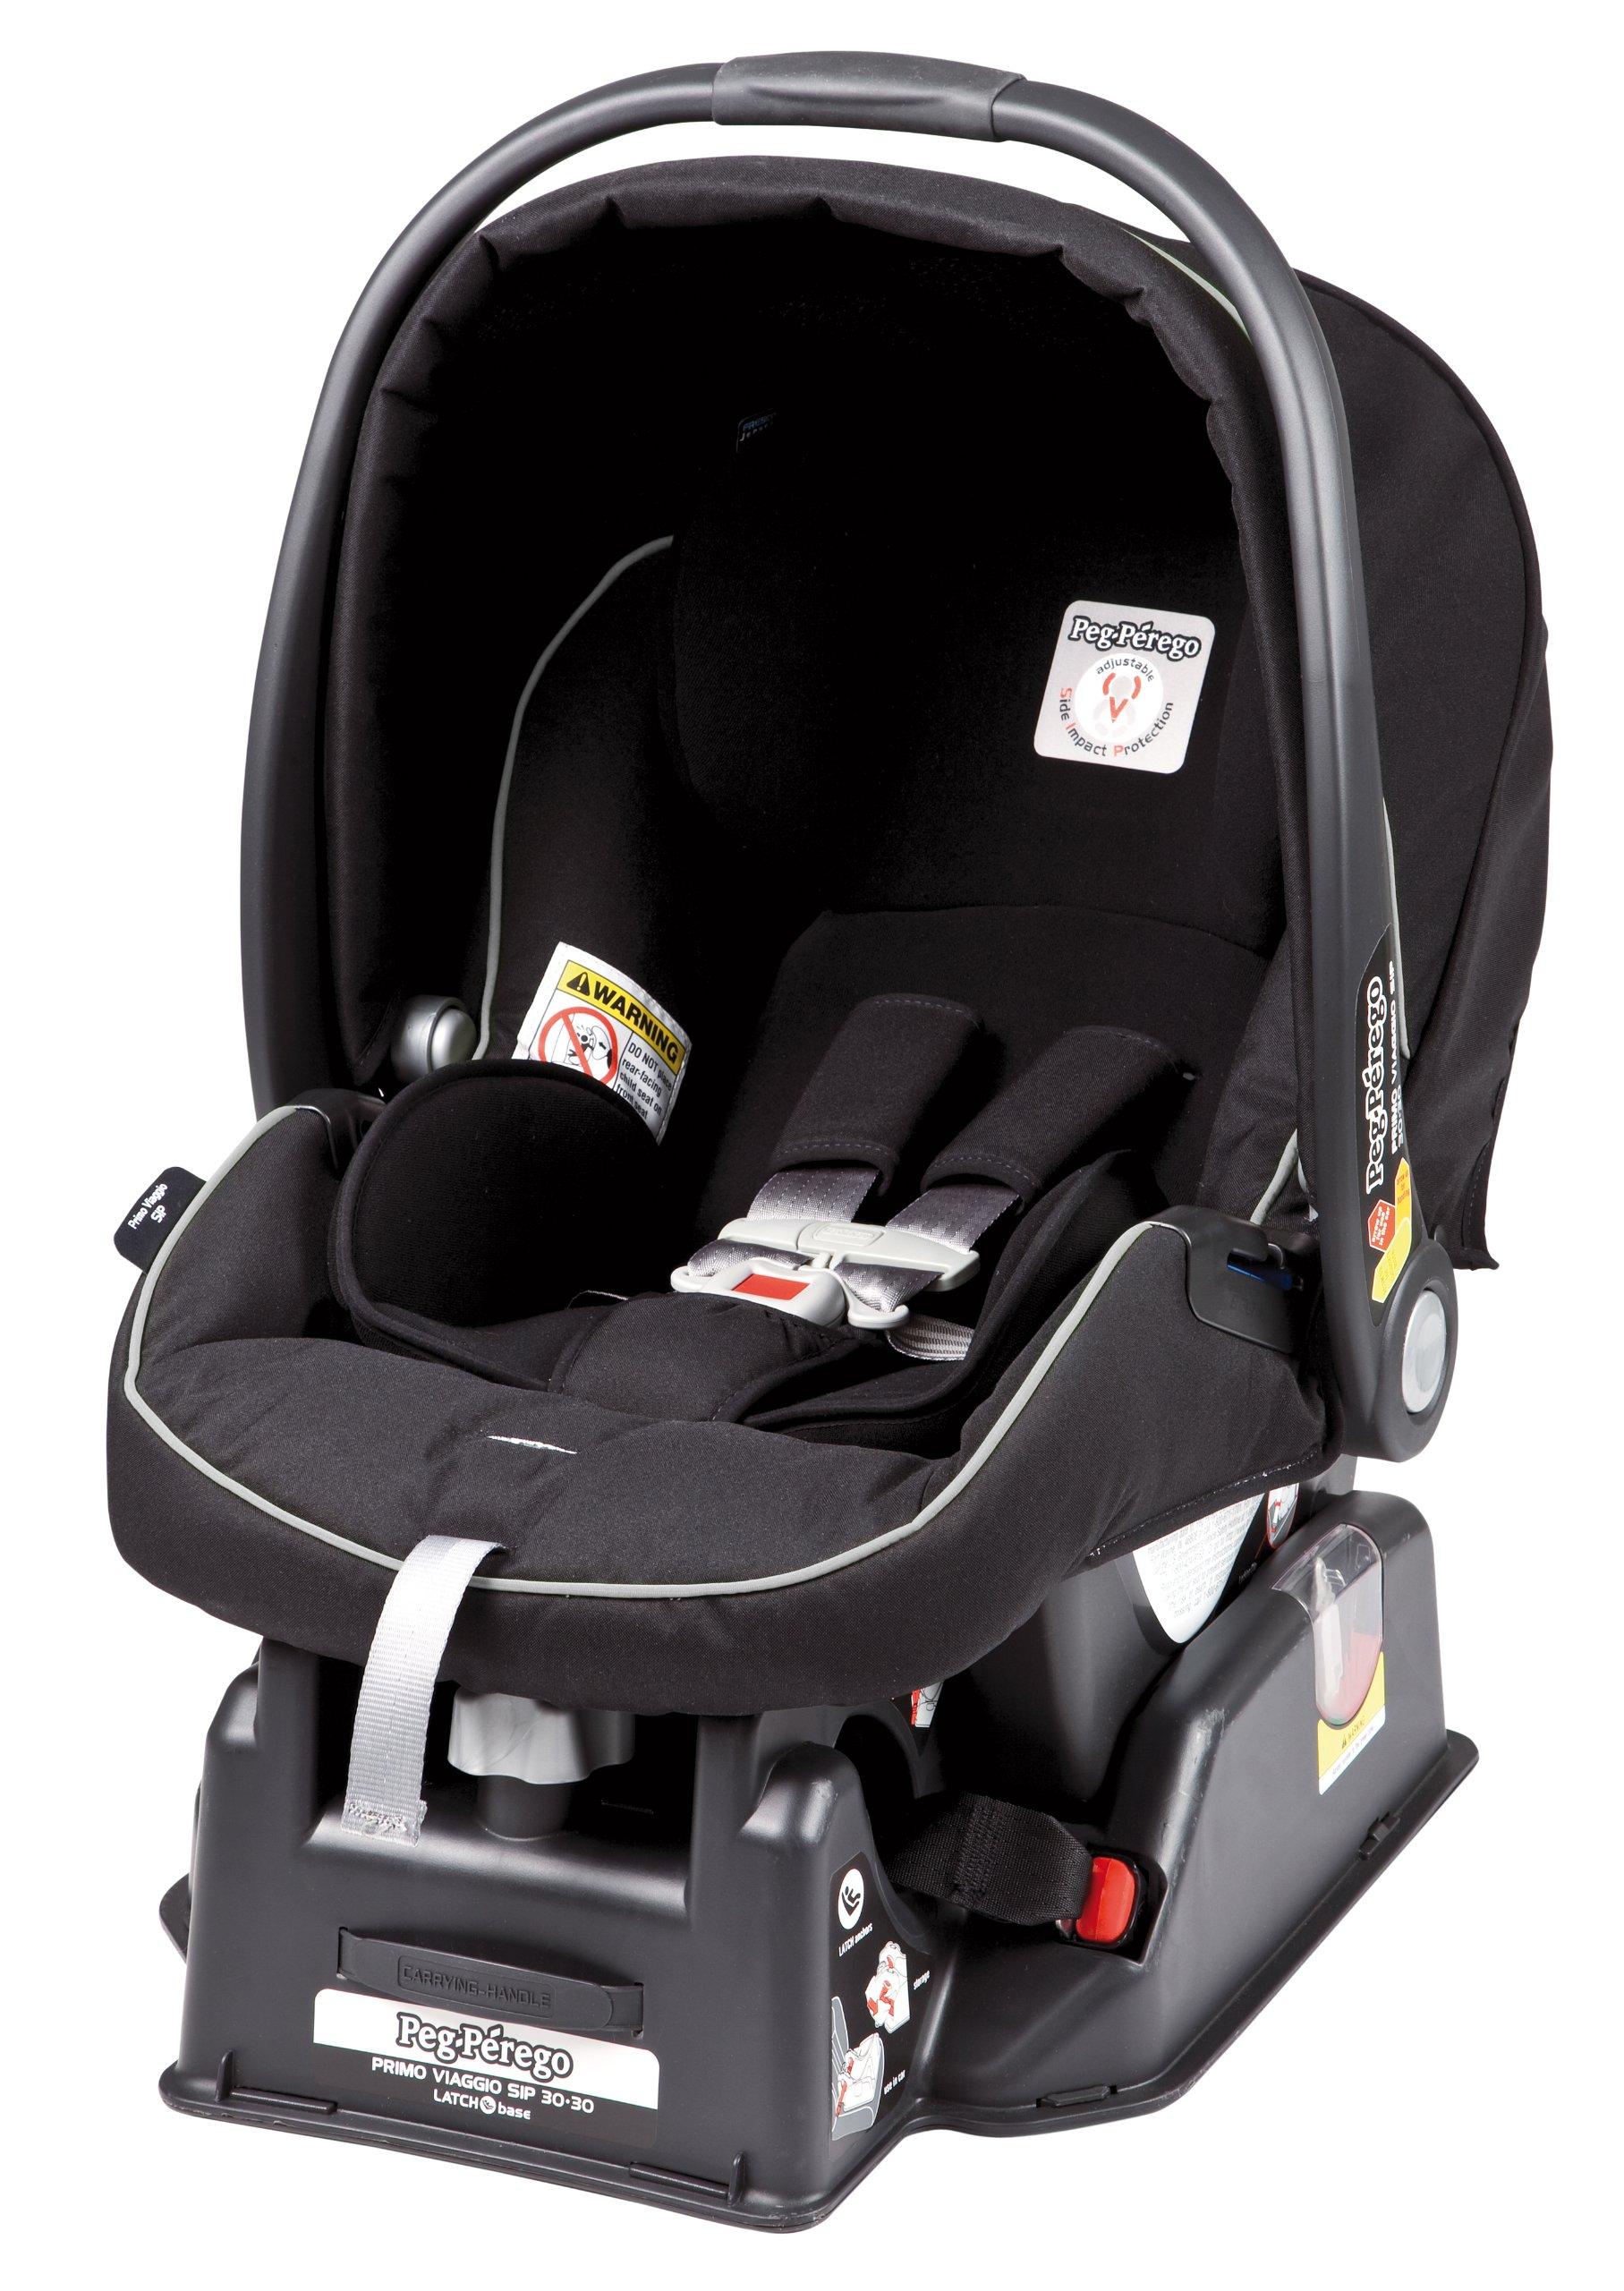 peg perego primo viaggio sip 30 30 infant car seat nero reflect ebay. Black Bedroom Furniture Sets. Home Design Ideas